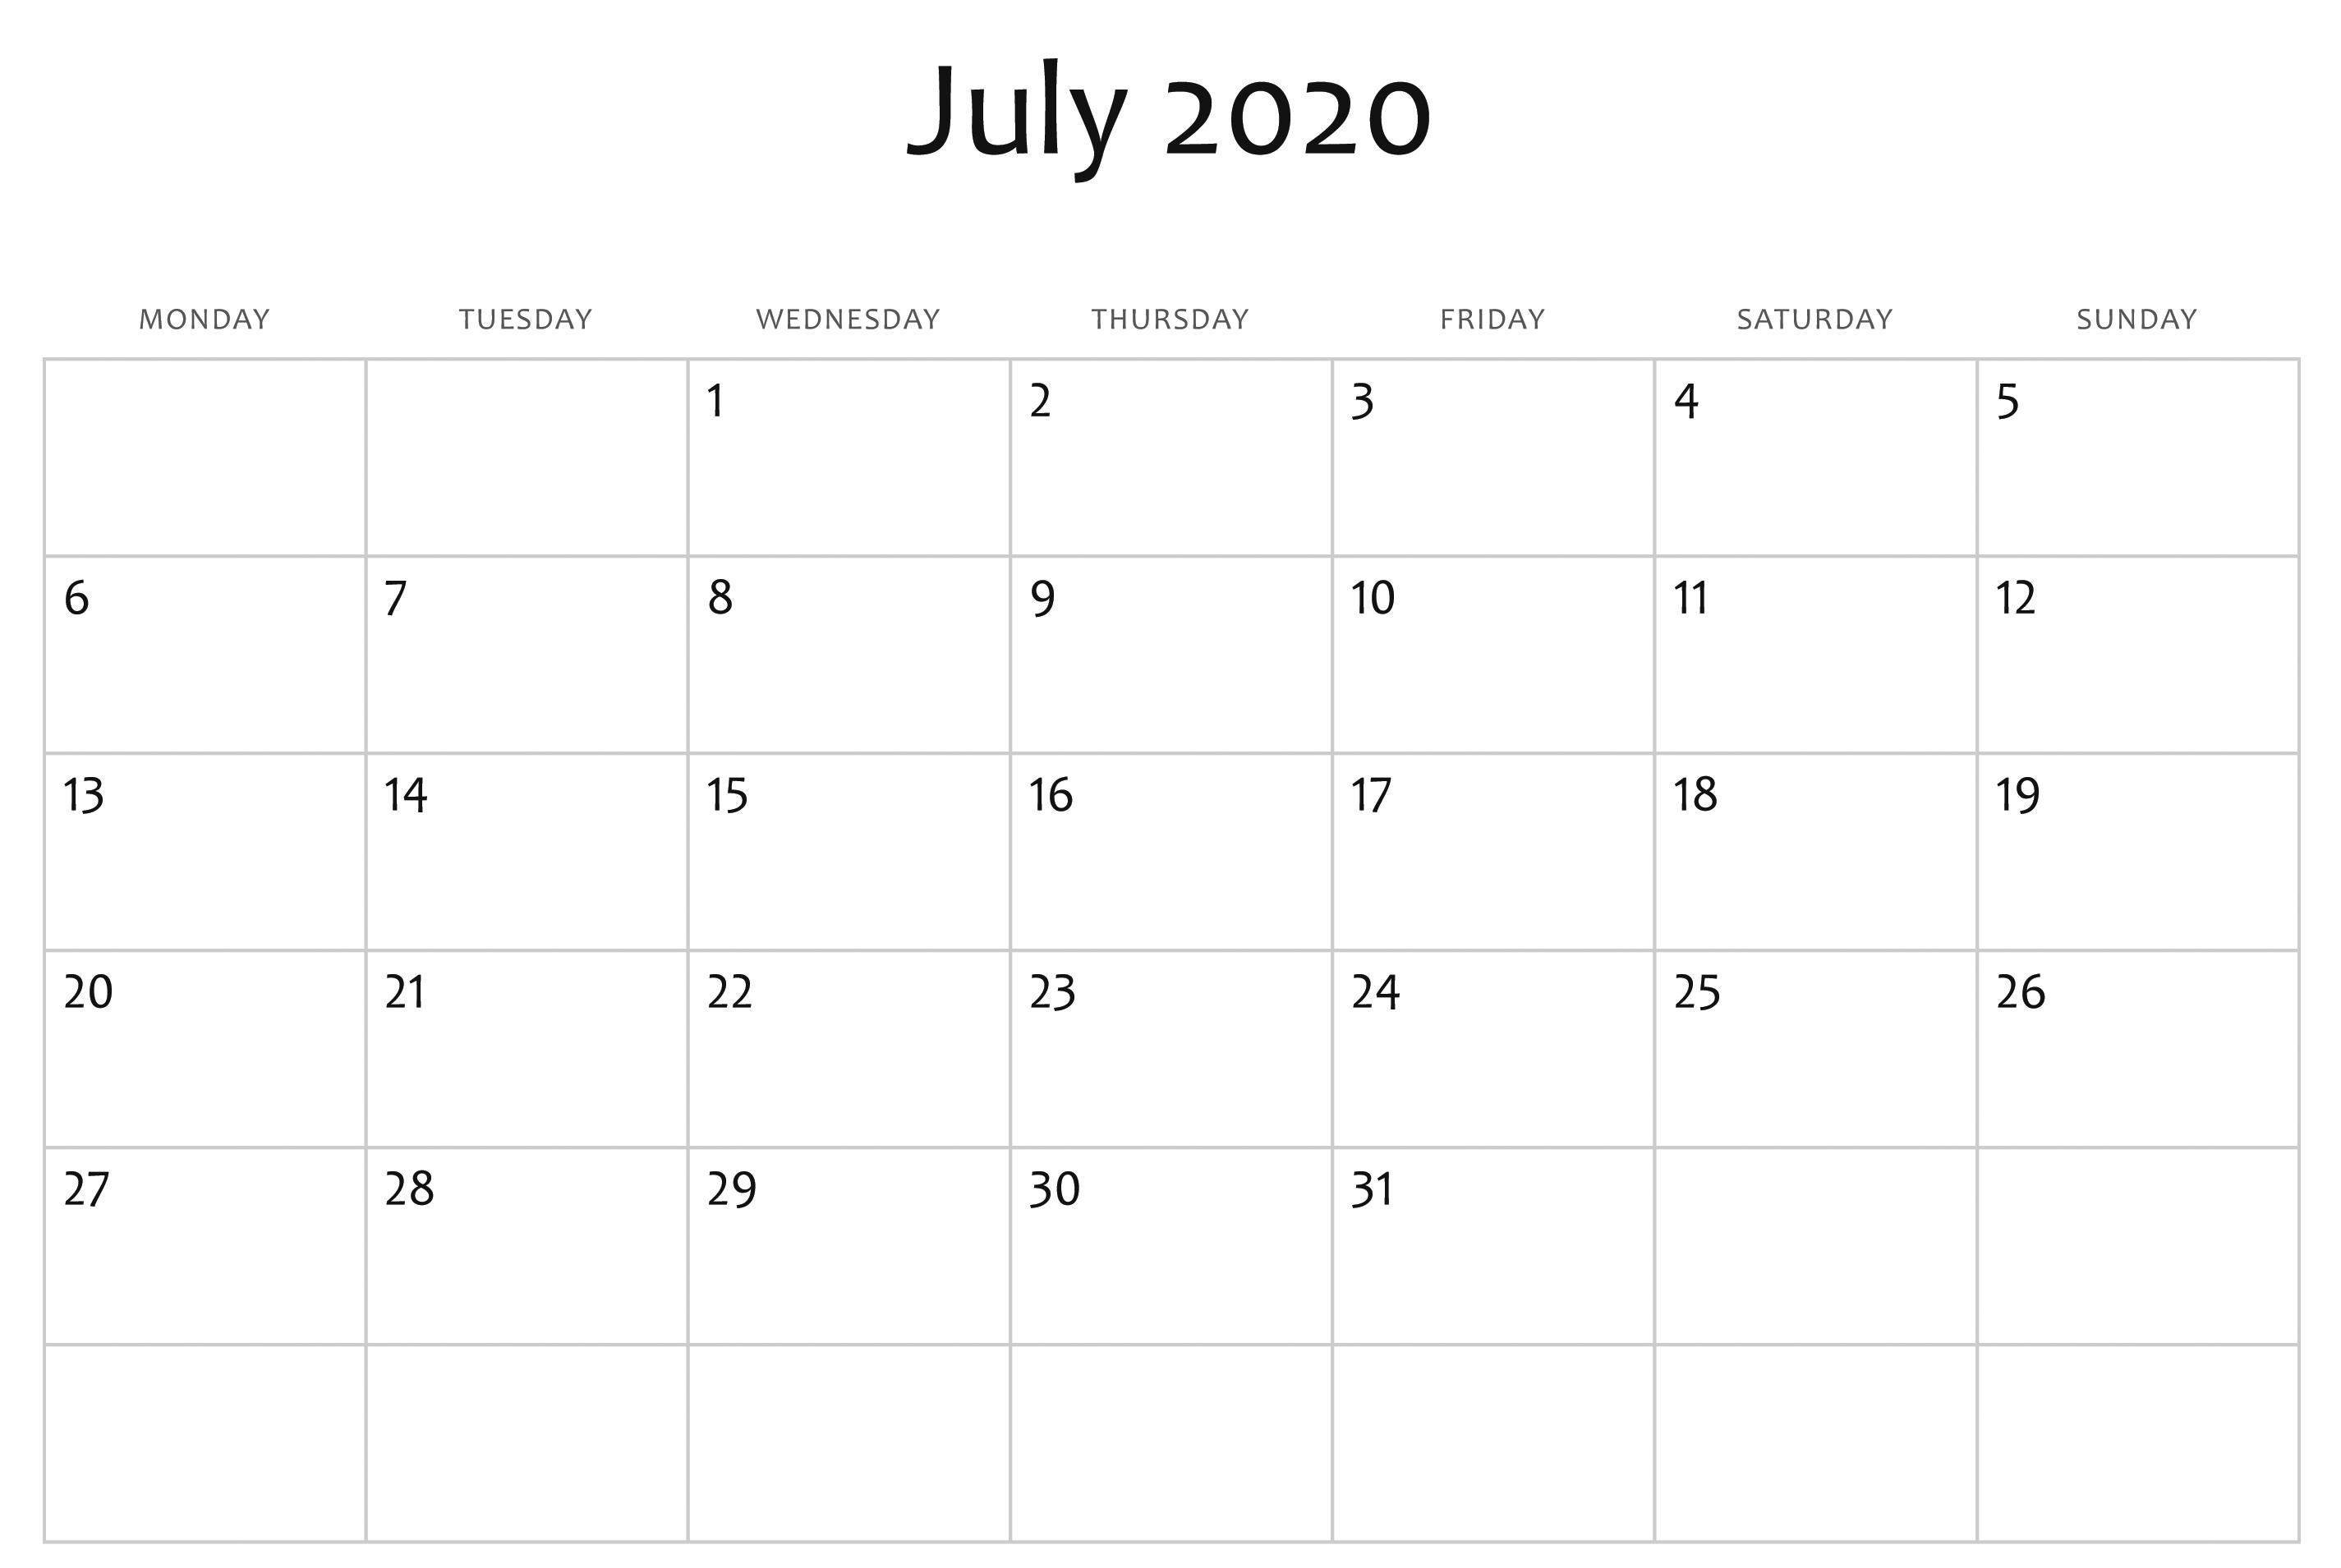 July 2020 Calendar Printable.Awesome July 2020 Calendar Pdf Word Excel Template